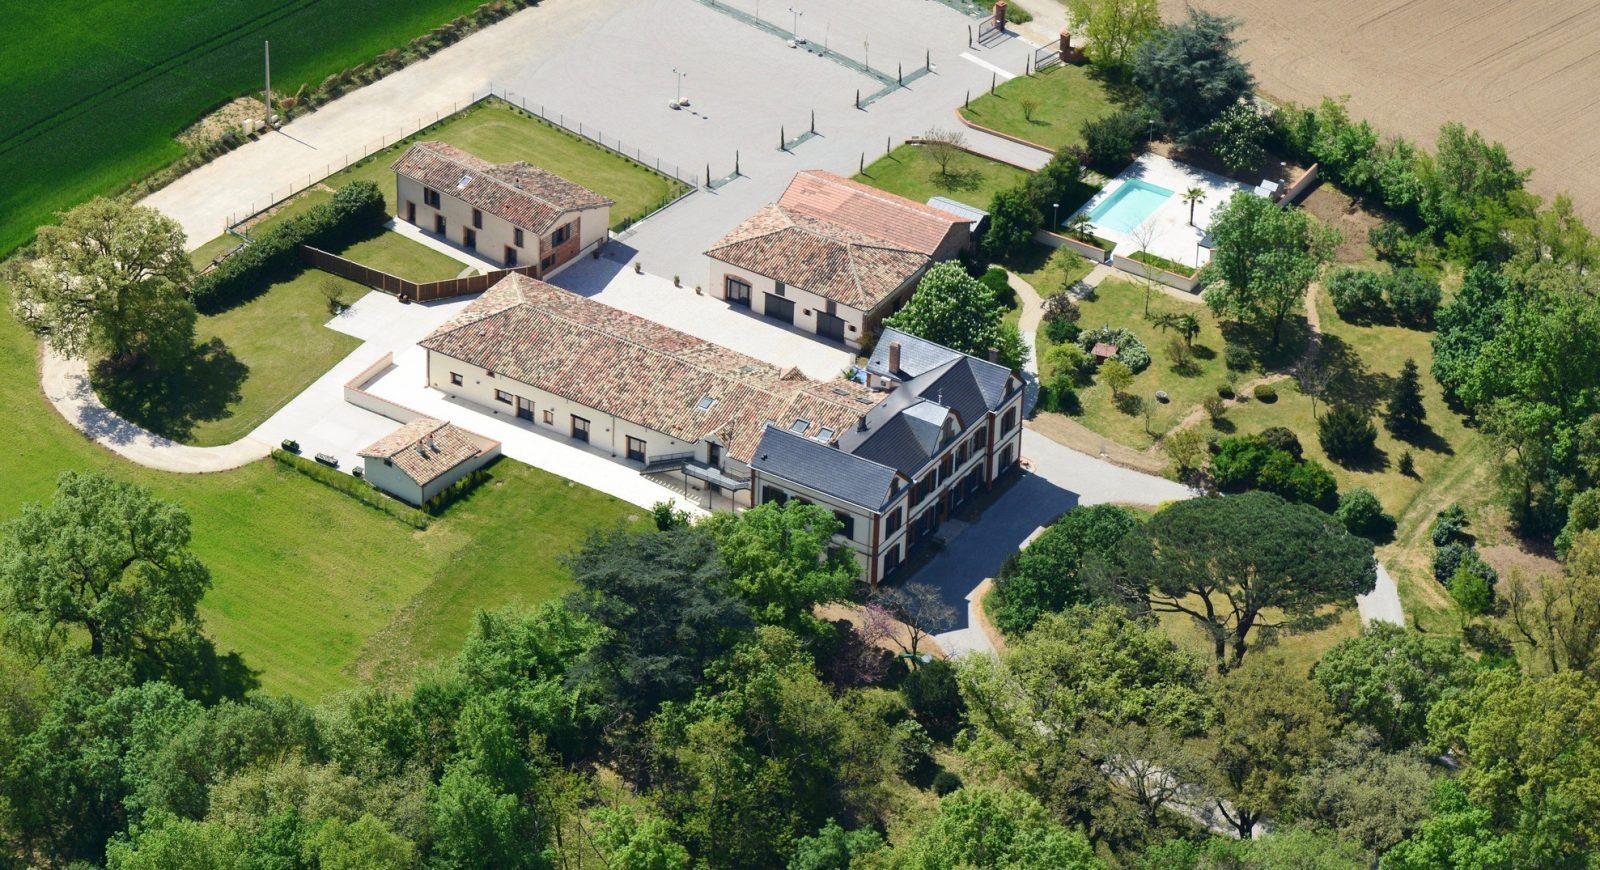 Hôtel Domaine d'en Fargou – Saint-Sulpice – Tarn